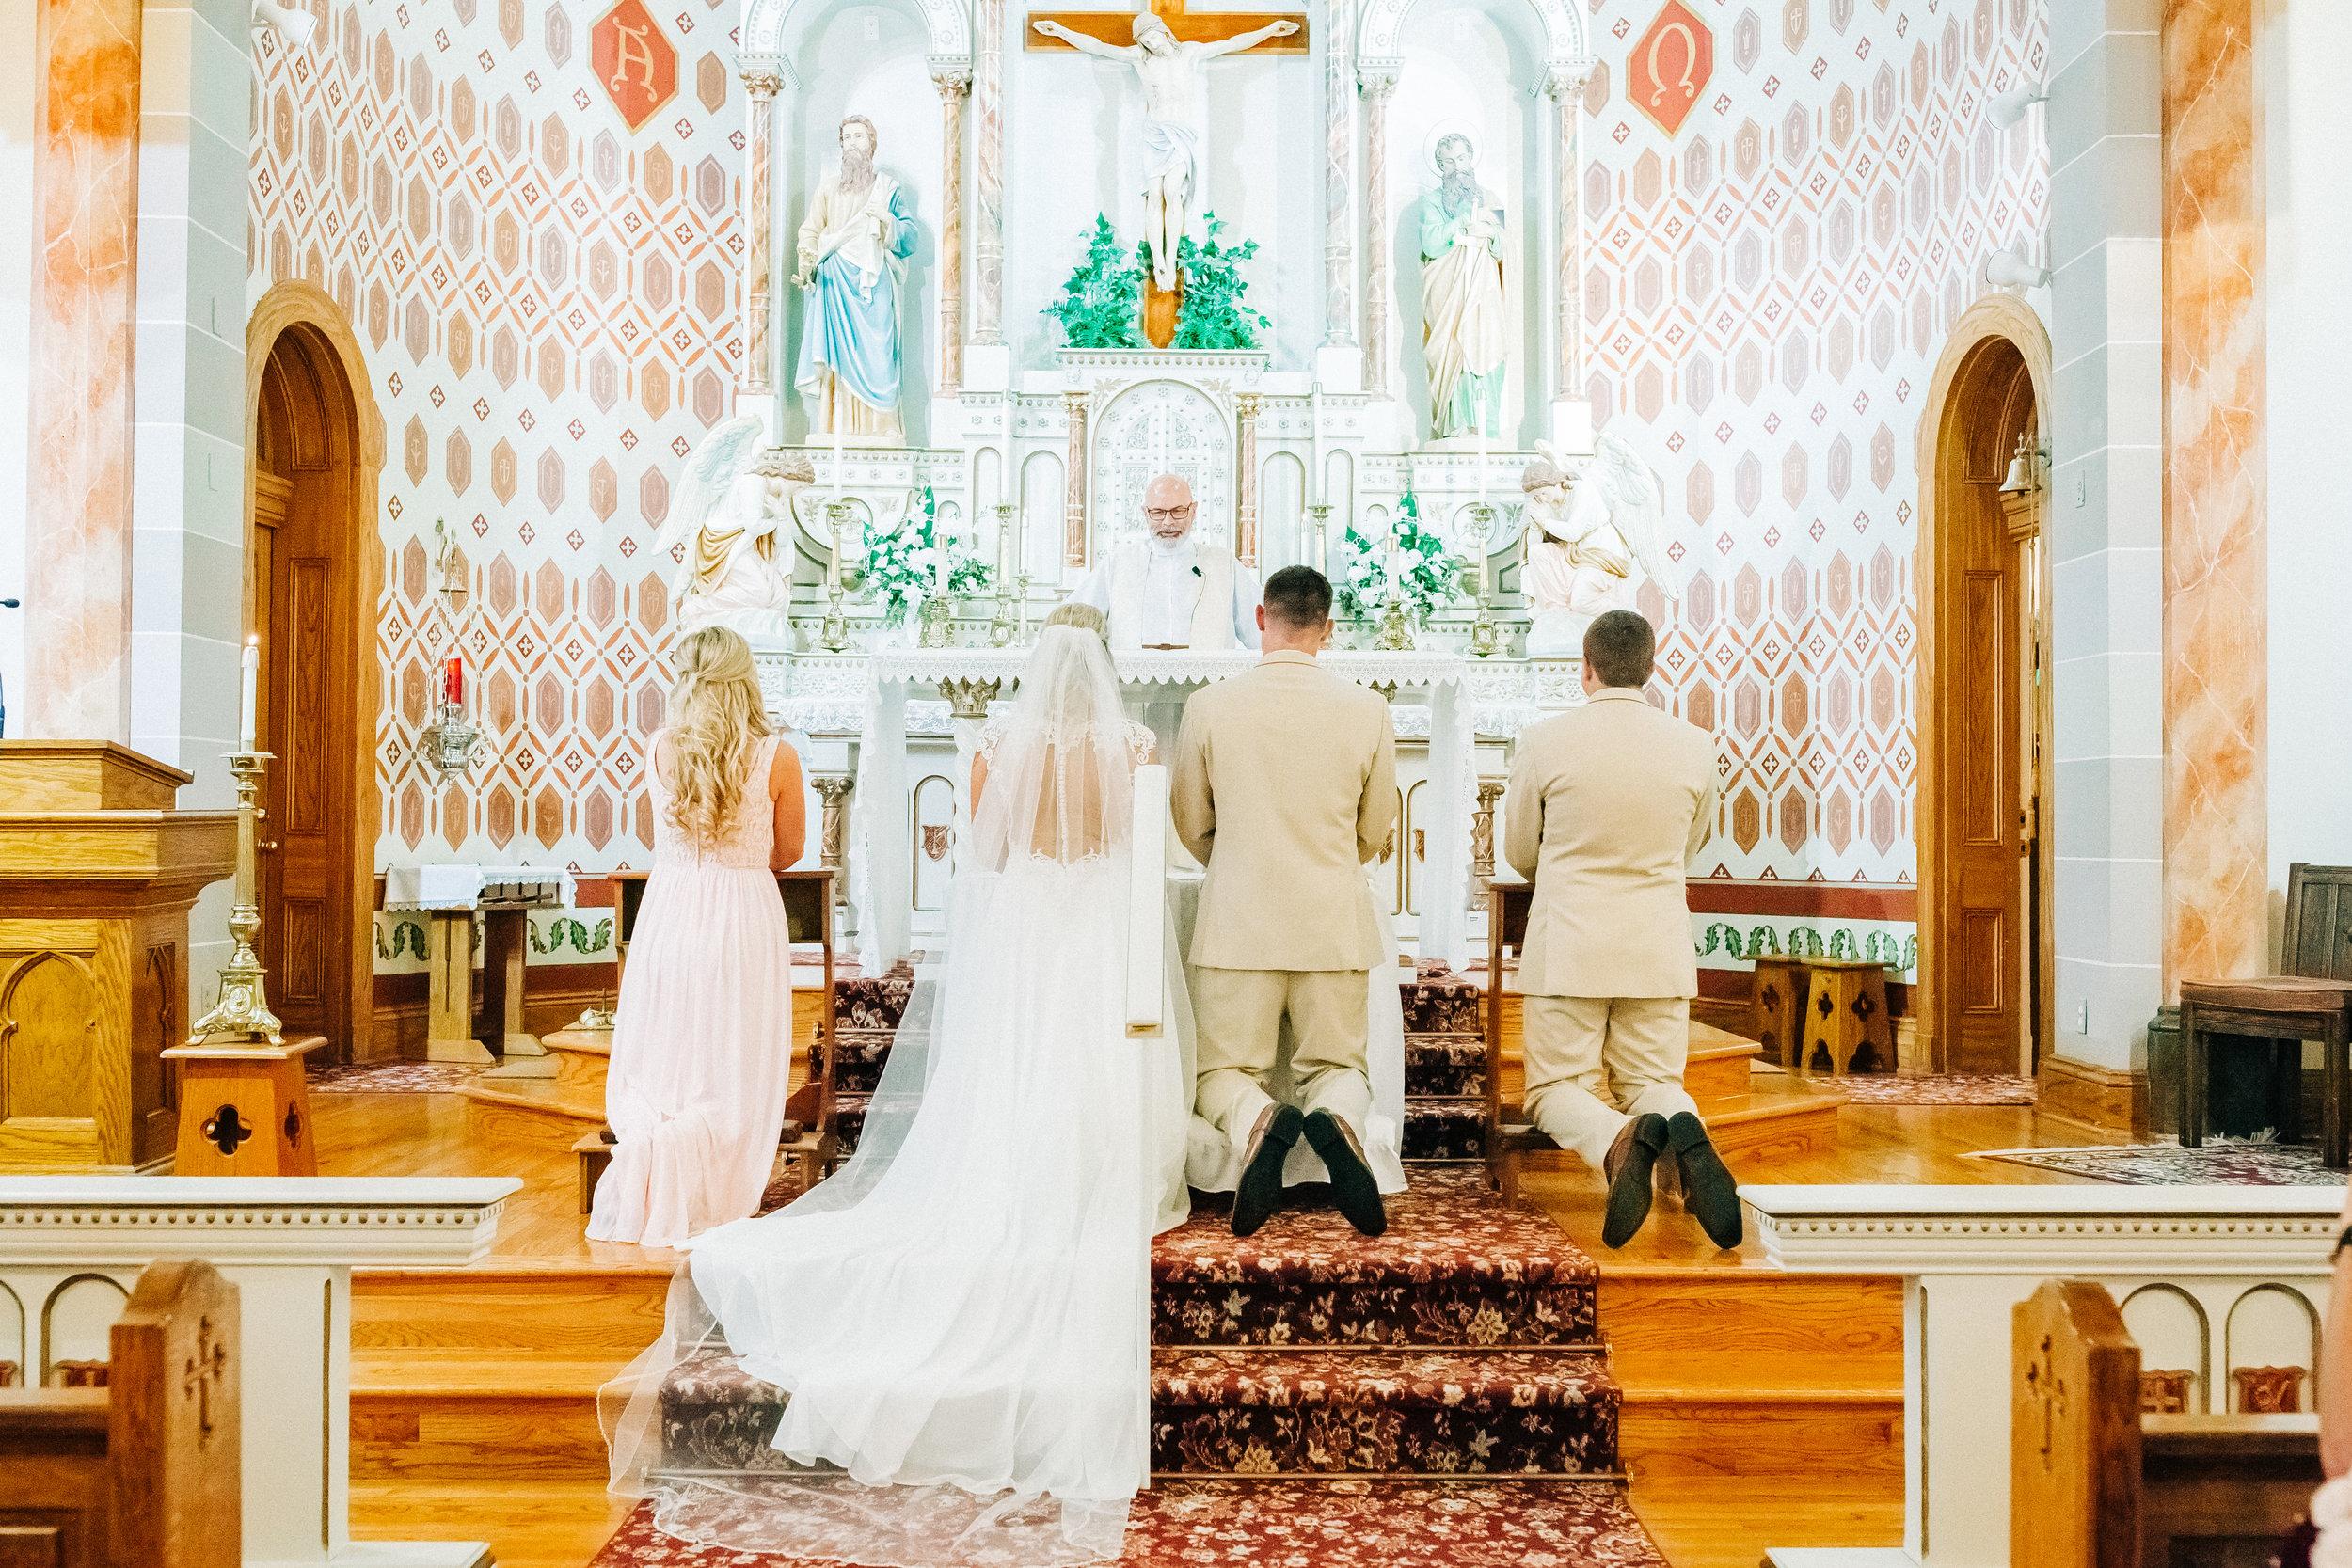 Dorothy_Louise_Photography_Marissa_Jake_Wentzville_MO_Wedding-76.jpg